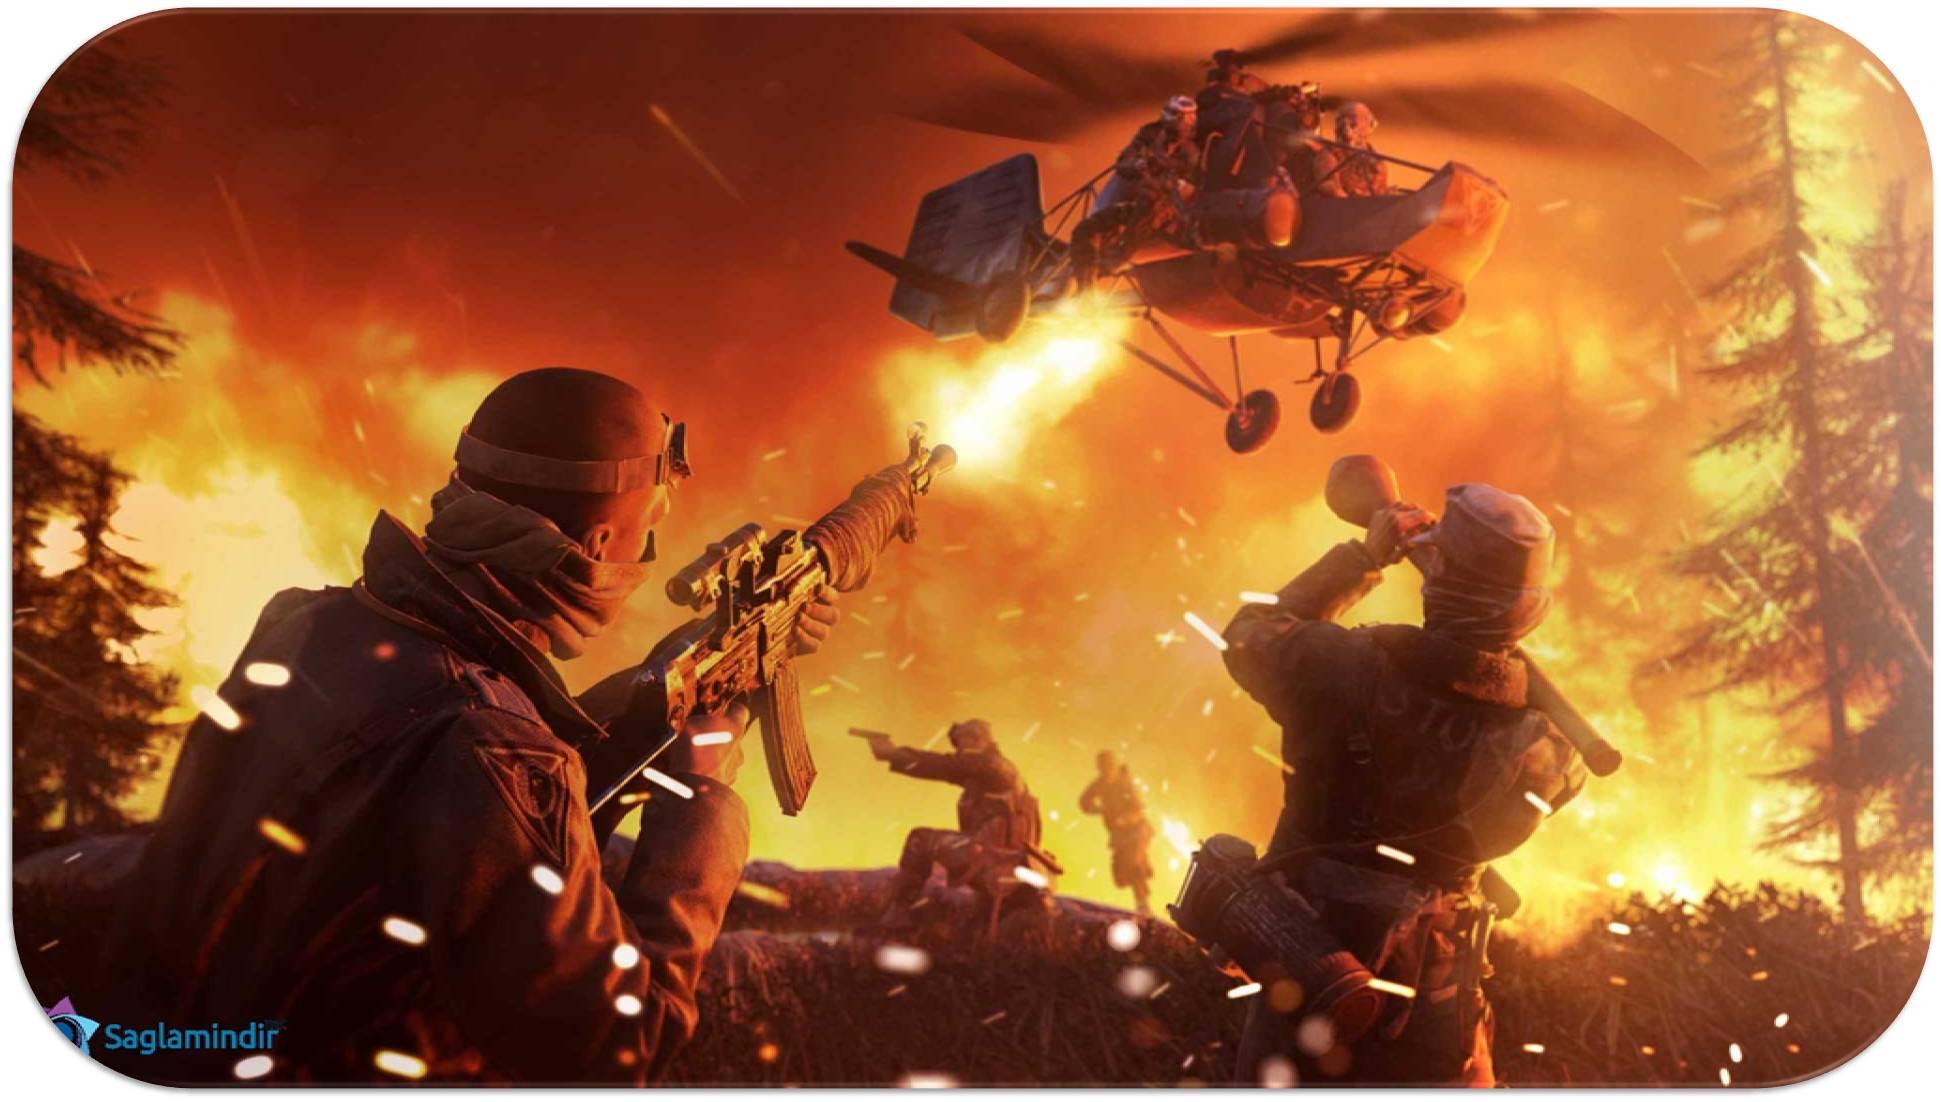 Battlefield 5 saglamindir